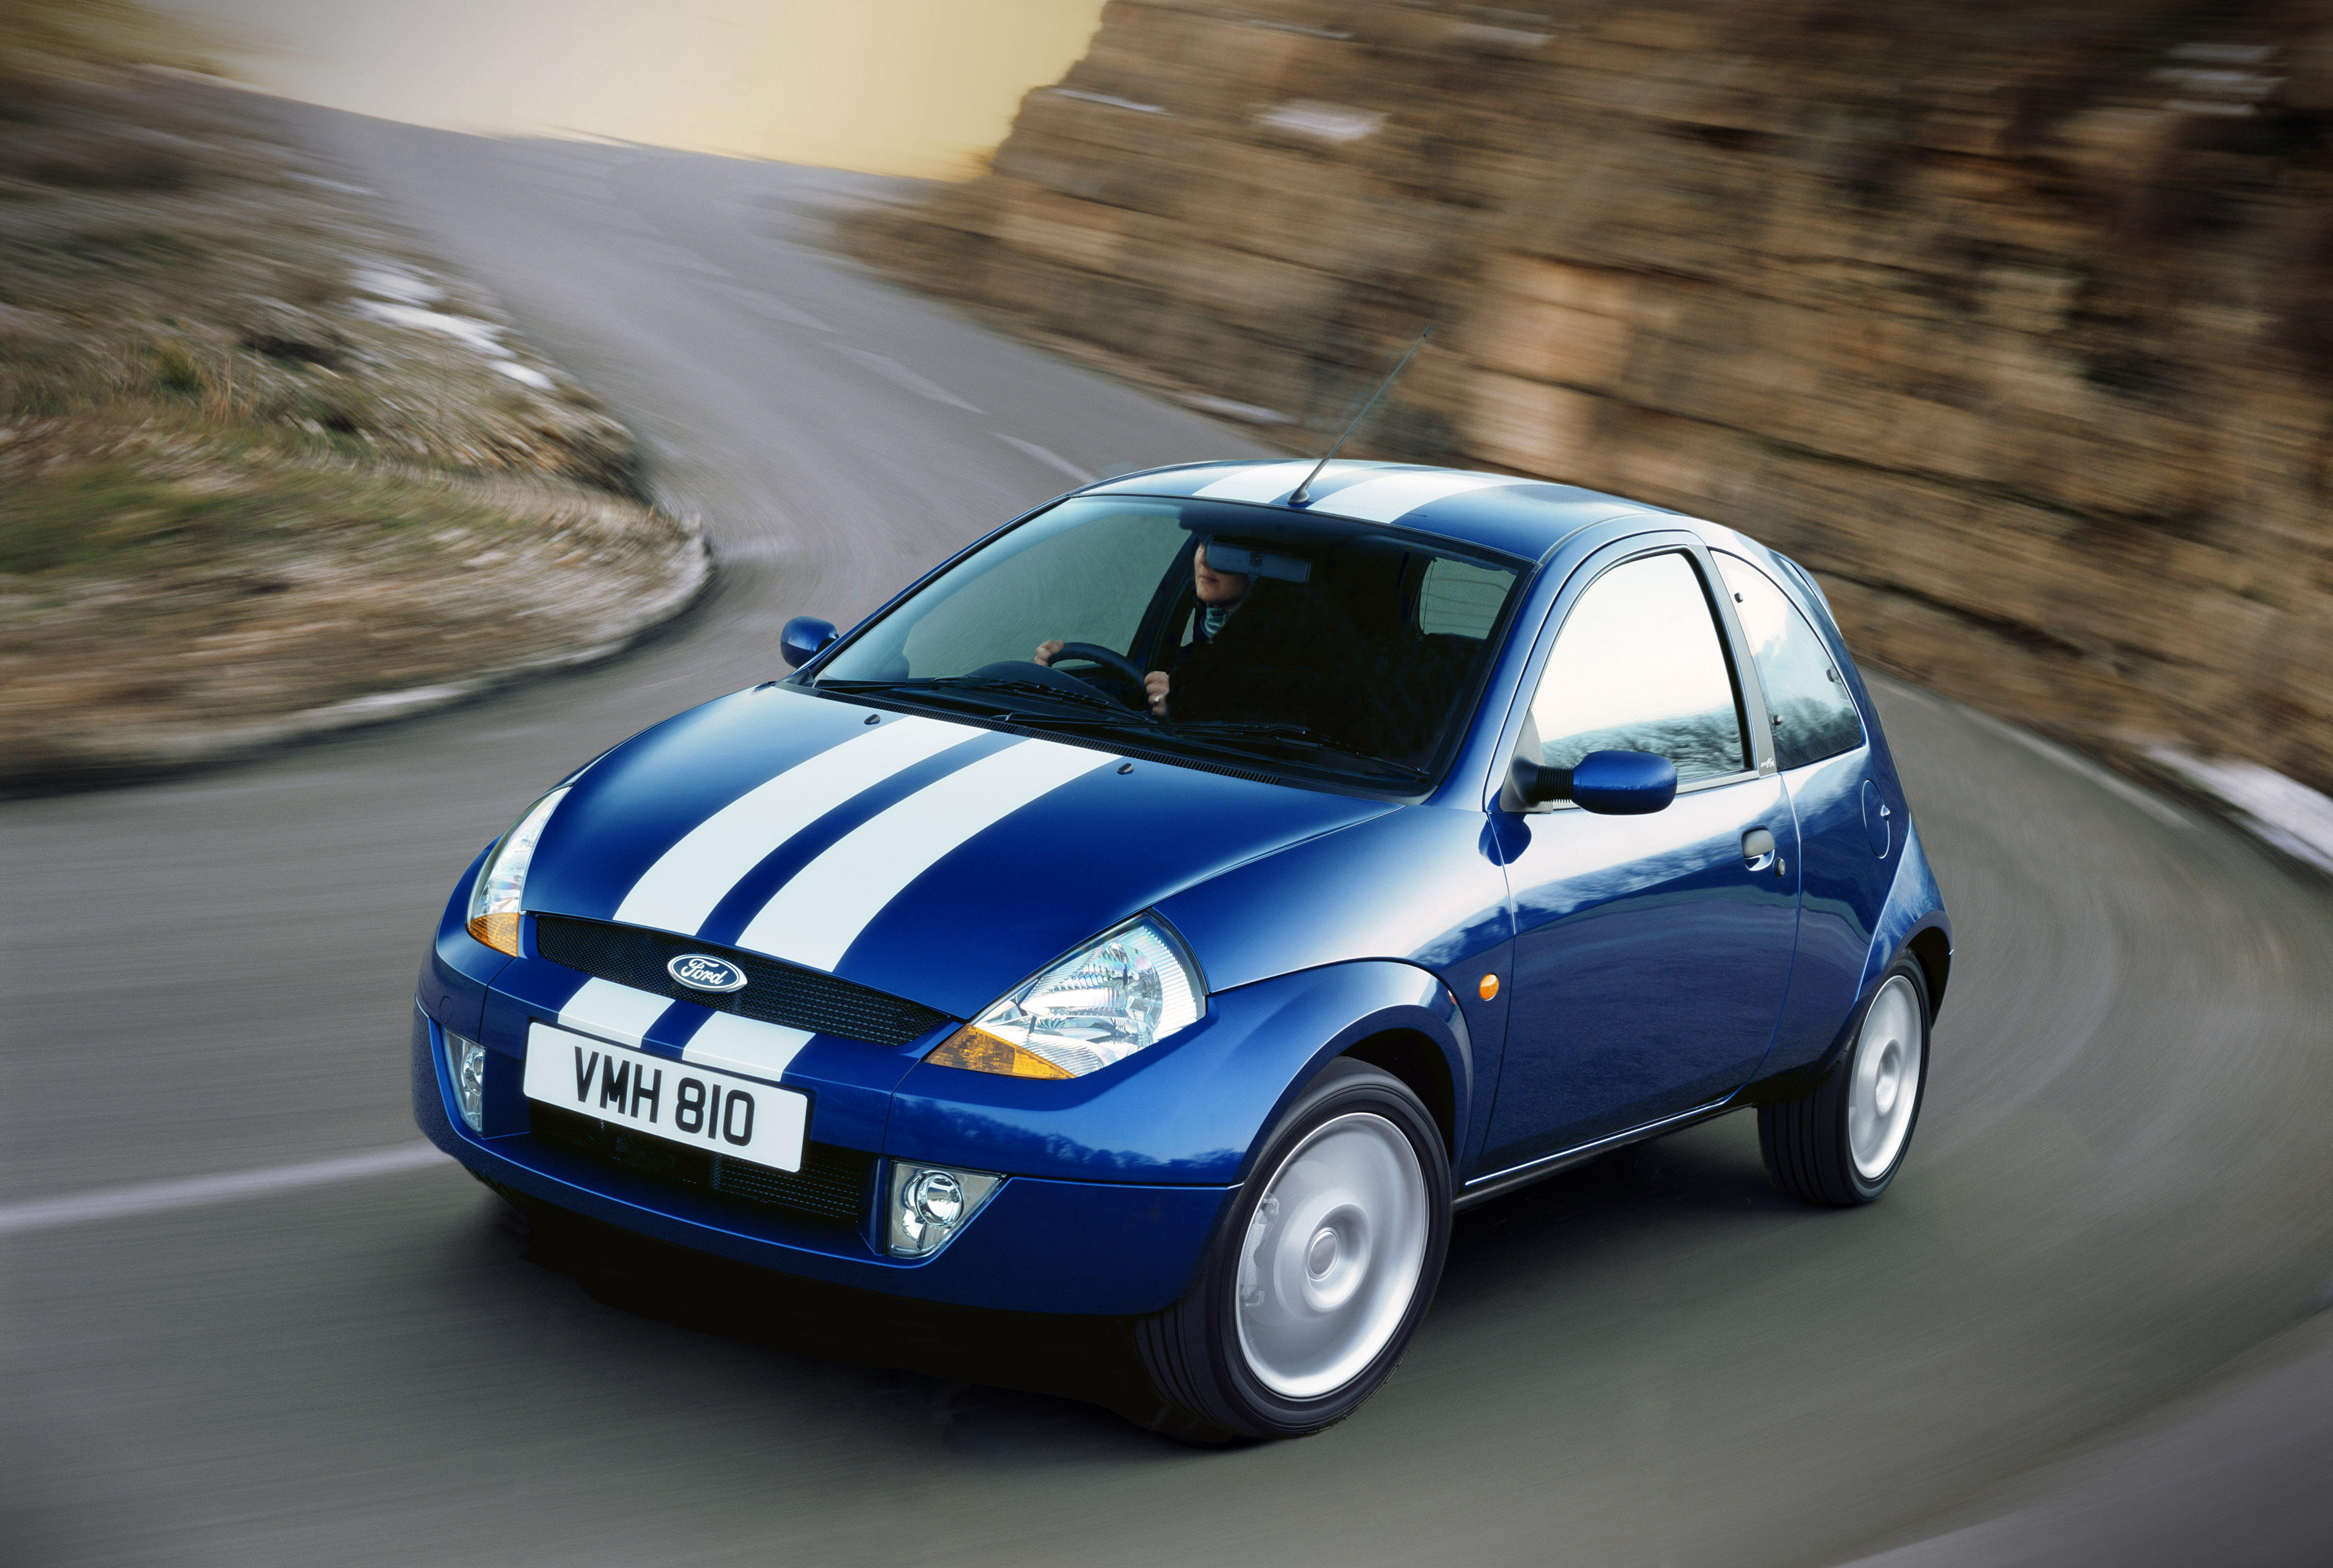 ford sport ka 1 6 i duratec 95 hp car technical data power torque fuel tank capacity fuel. Black Bedroom Furniture Sets. Home Design Ideas